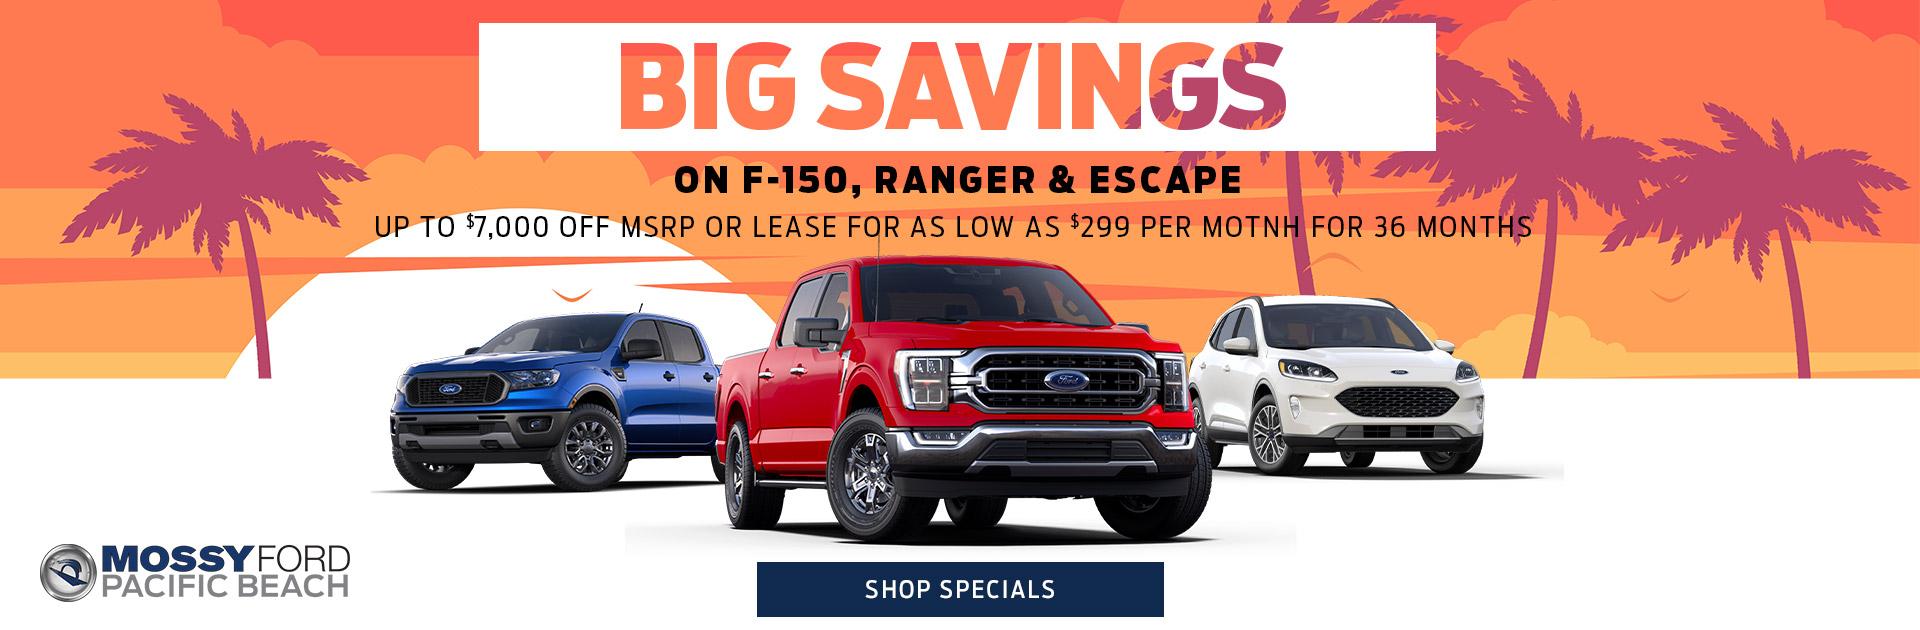 Mossy Ford Big Savings Hero